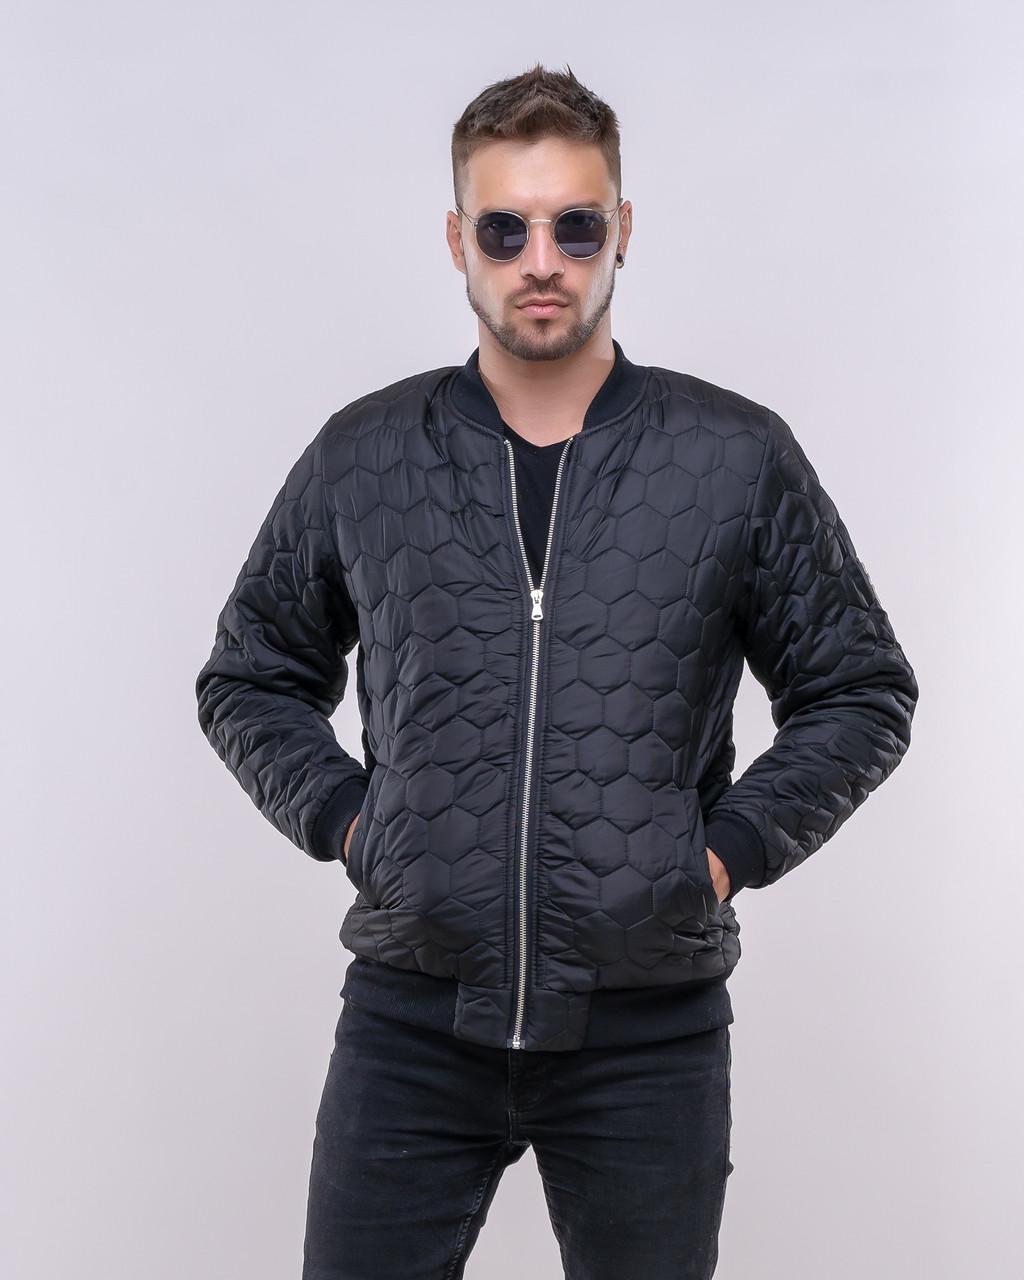 Стильная мужская куртка-бомбер